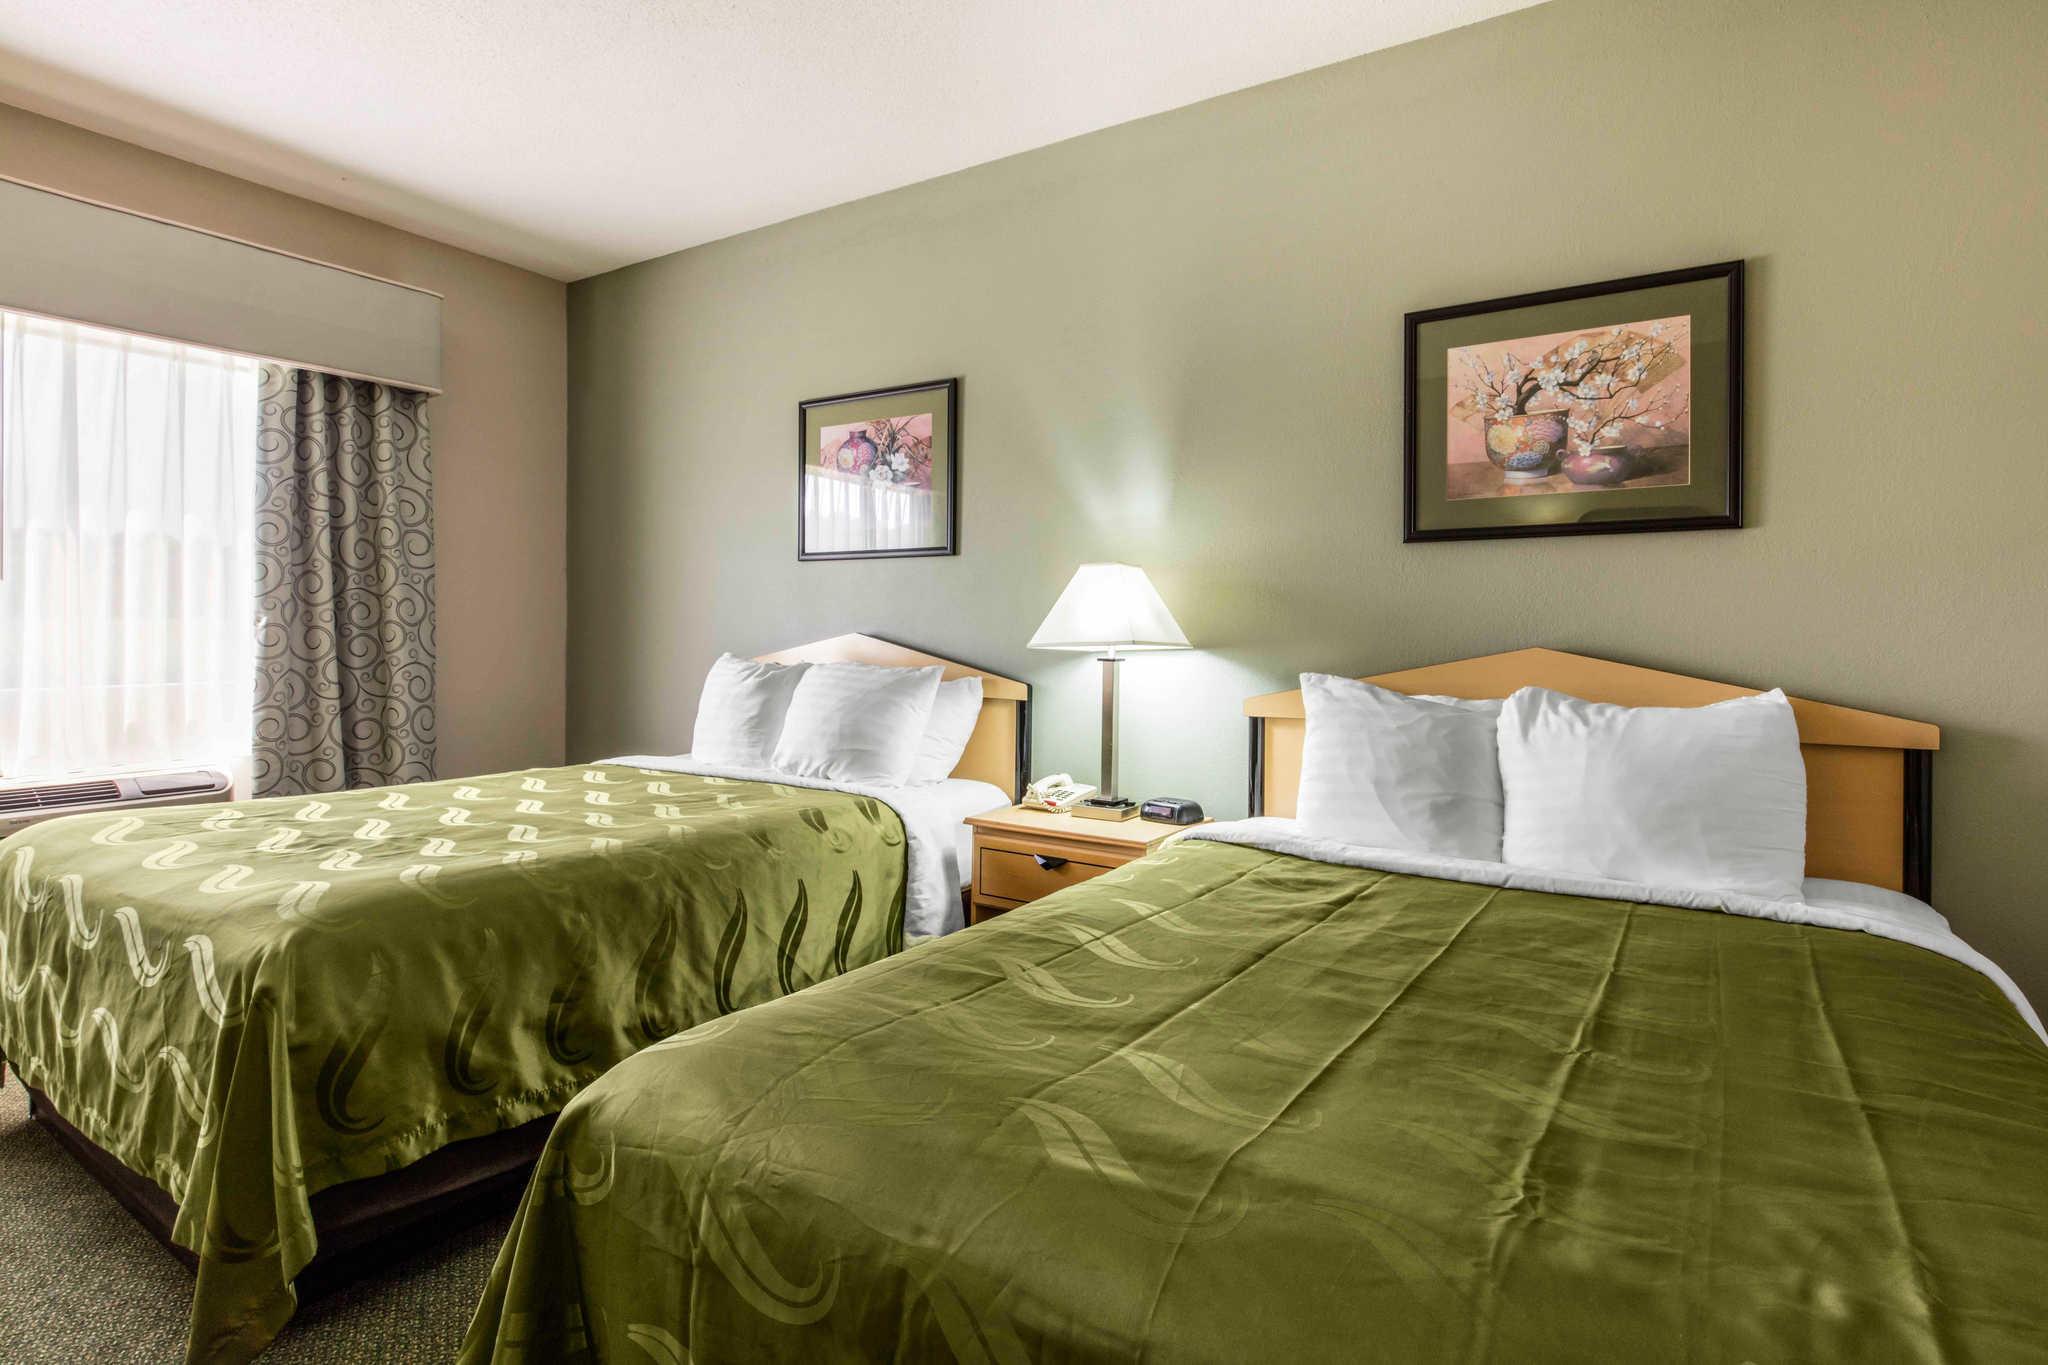 Quality Inn & Suites Jackson Int'l Airport image 13